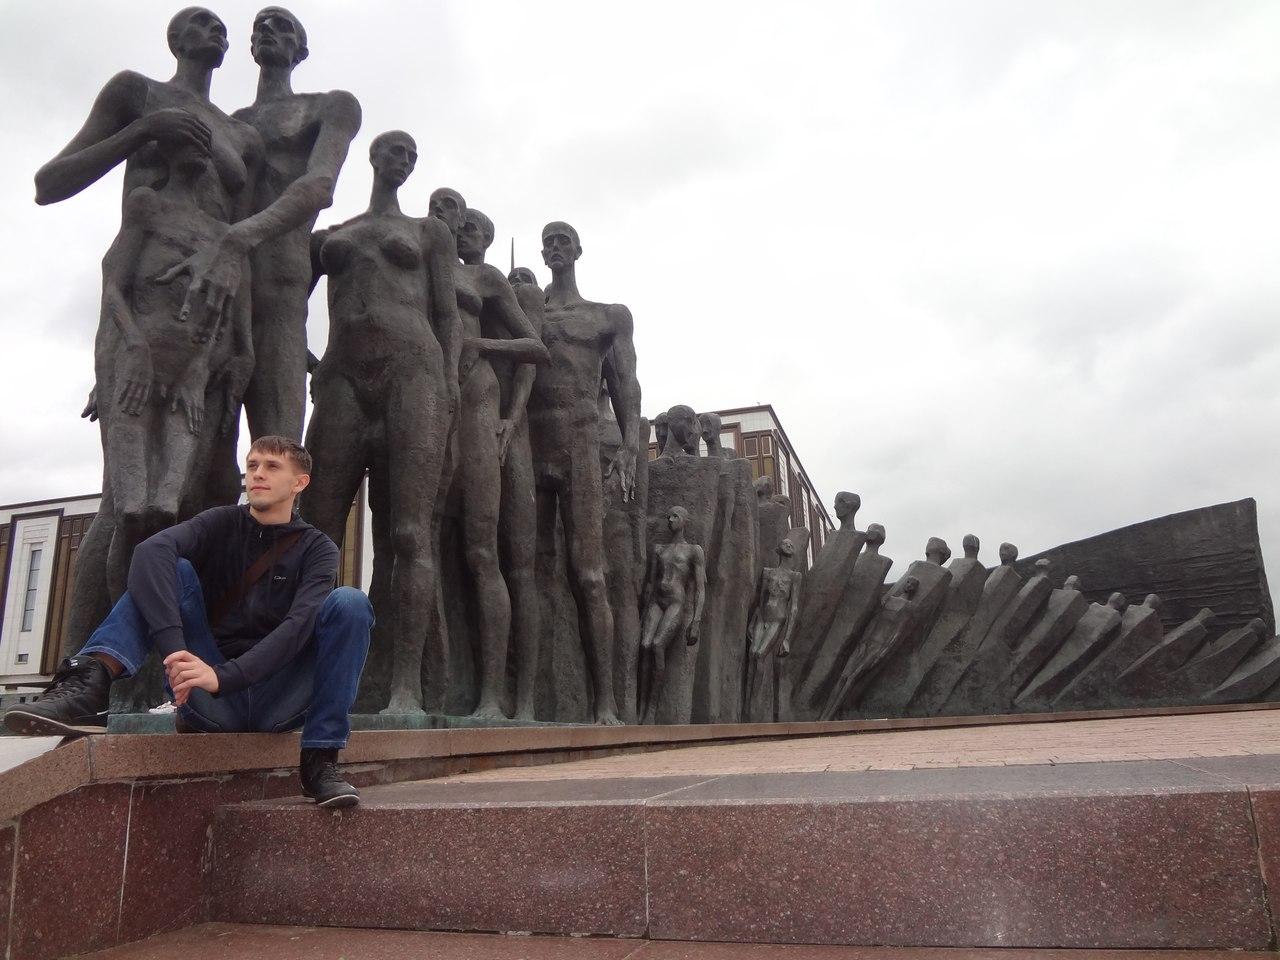 Дмитрий Фон-Крафт, Комсомольск-на-Амуре - фото №11